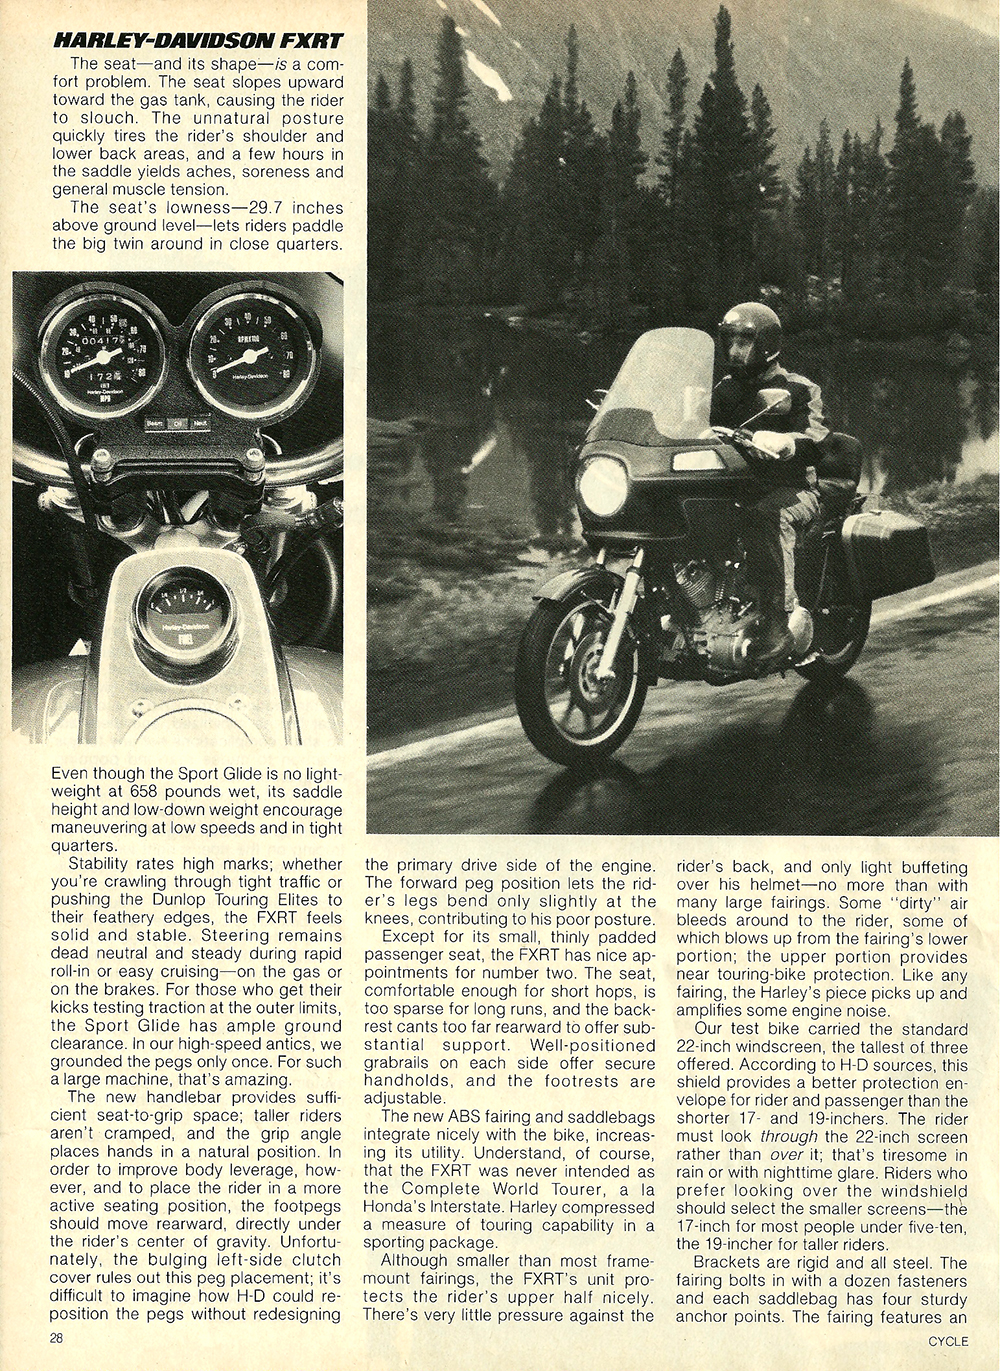 1983 Harley Davidson FXRT Sport Glide road test 5.jpg